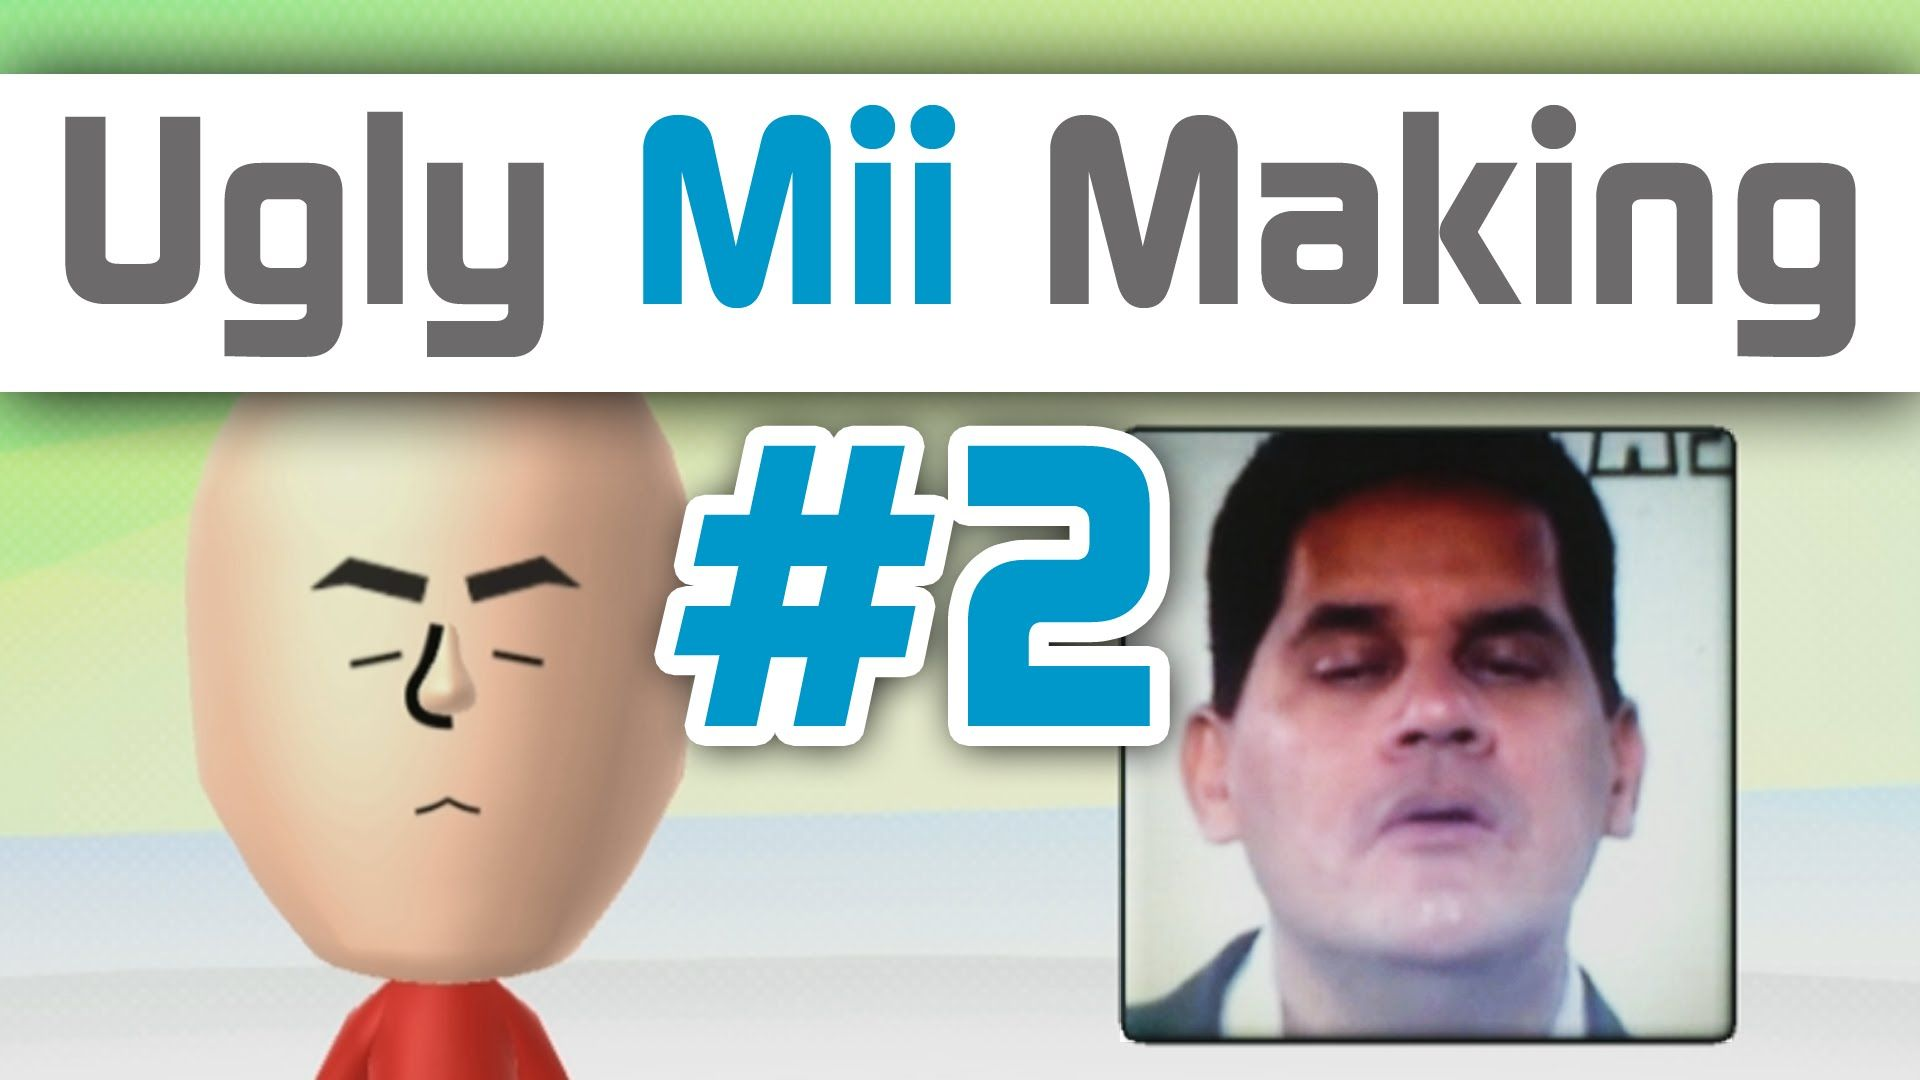 Ugly Mii Making Using Nintendo Wii U Gamepad Camera #2   Favorite